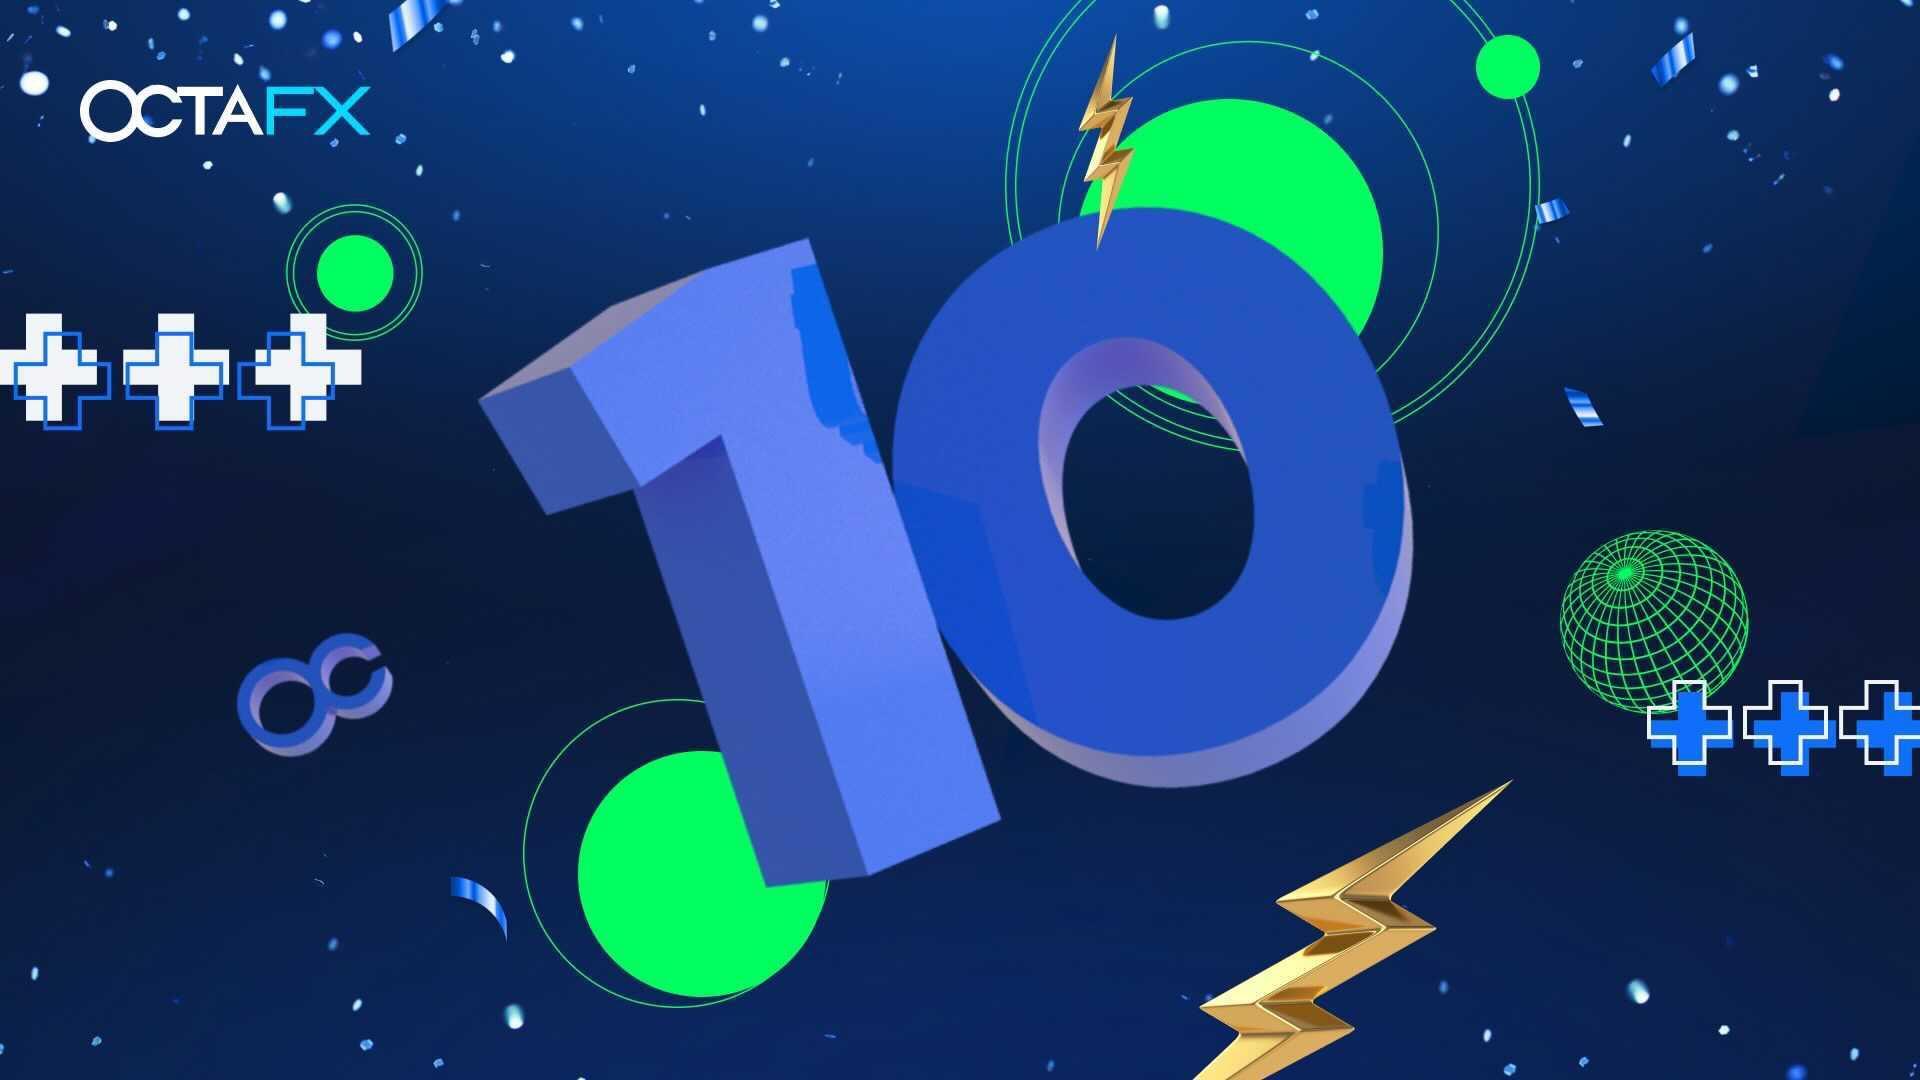 OctaFX Celebrates Ten Years in Business